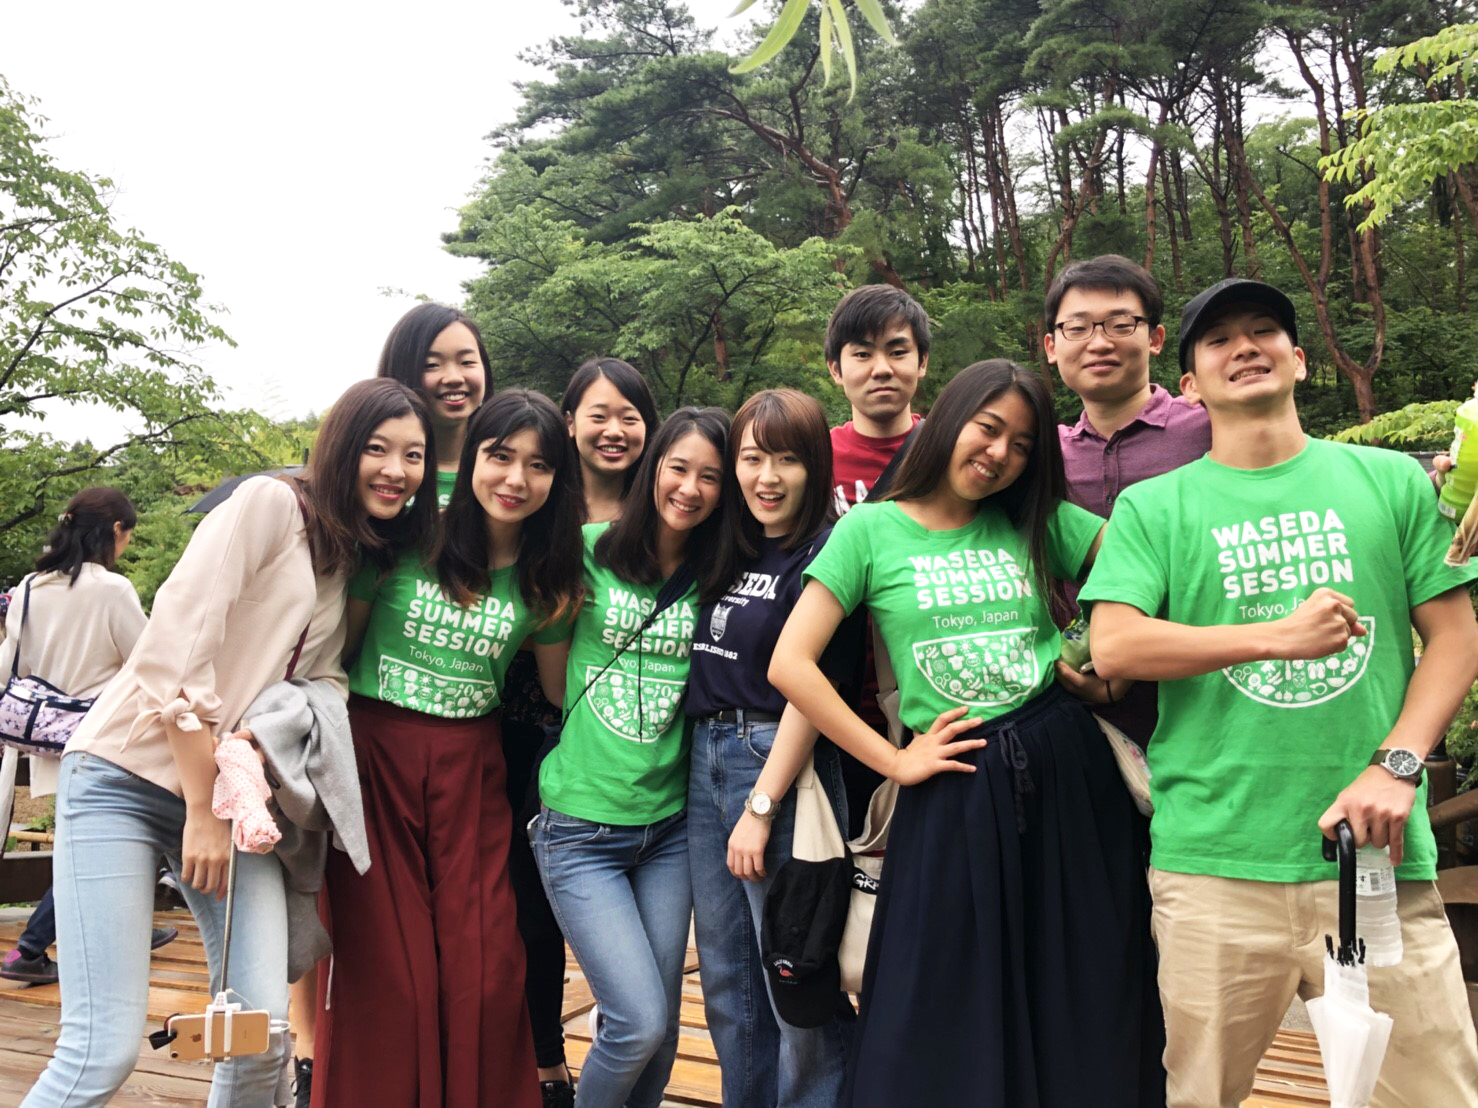 waseda students waseda summer session